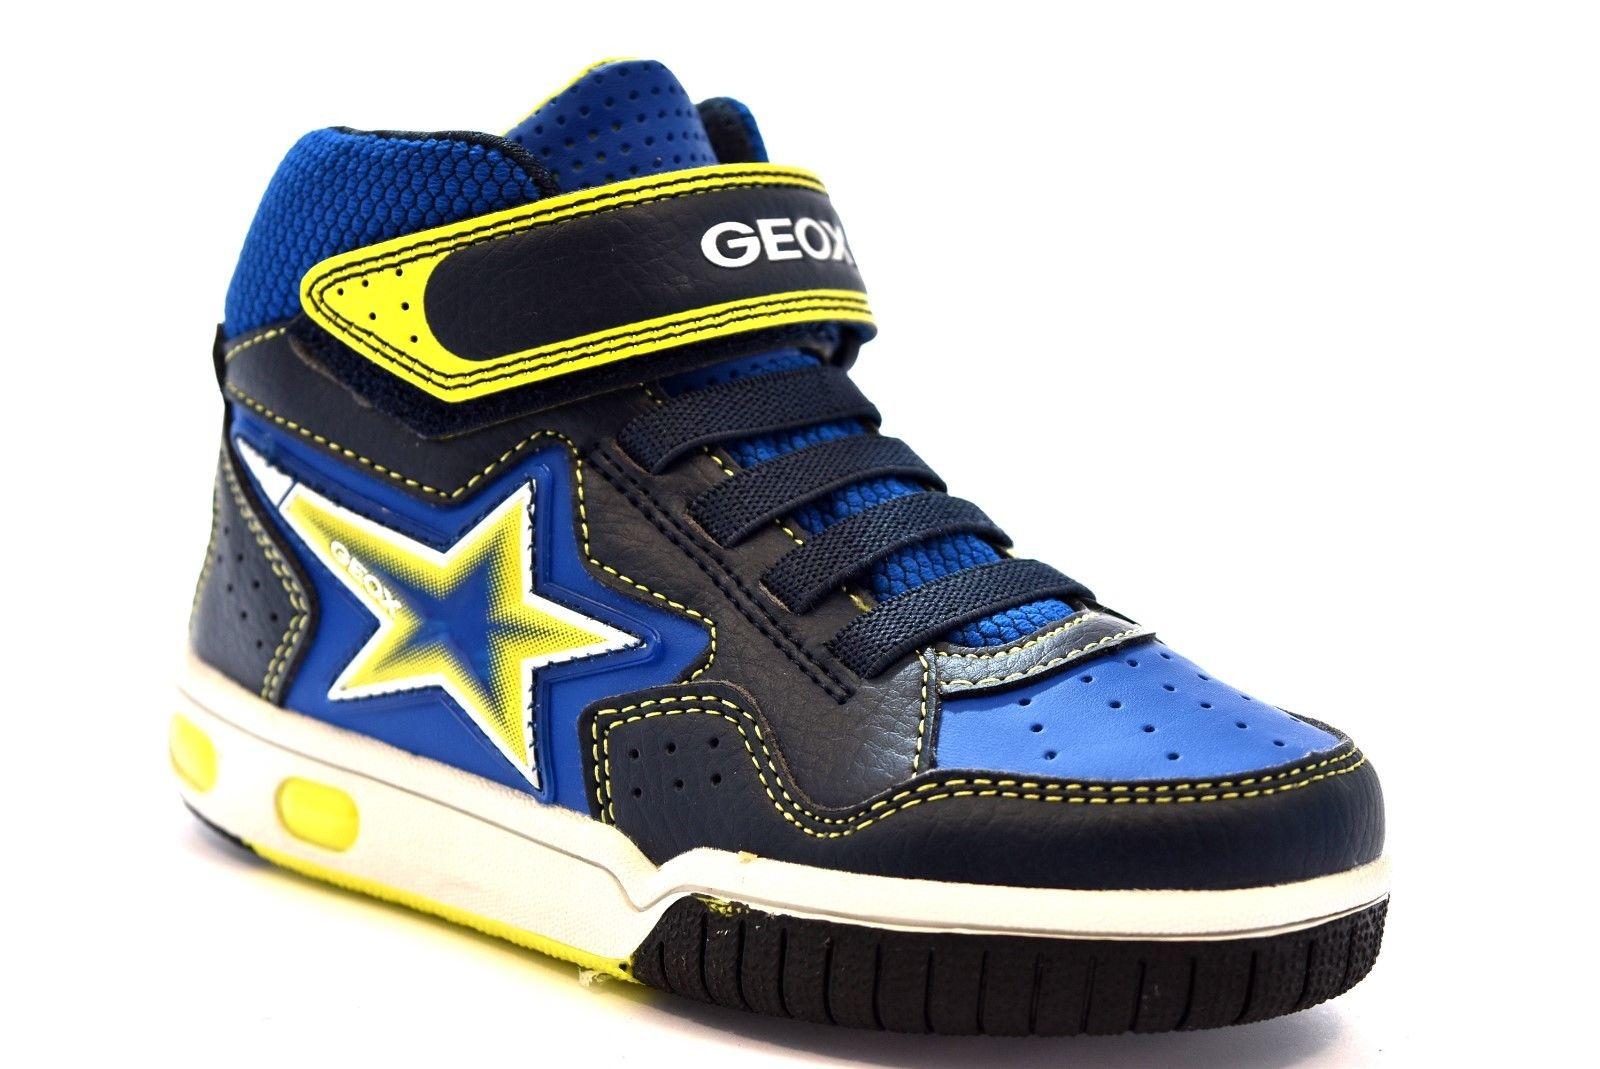 JR KOMMODOR BOY White Bambino   Sneakers Geox ⋆ MU ME